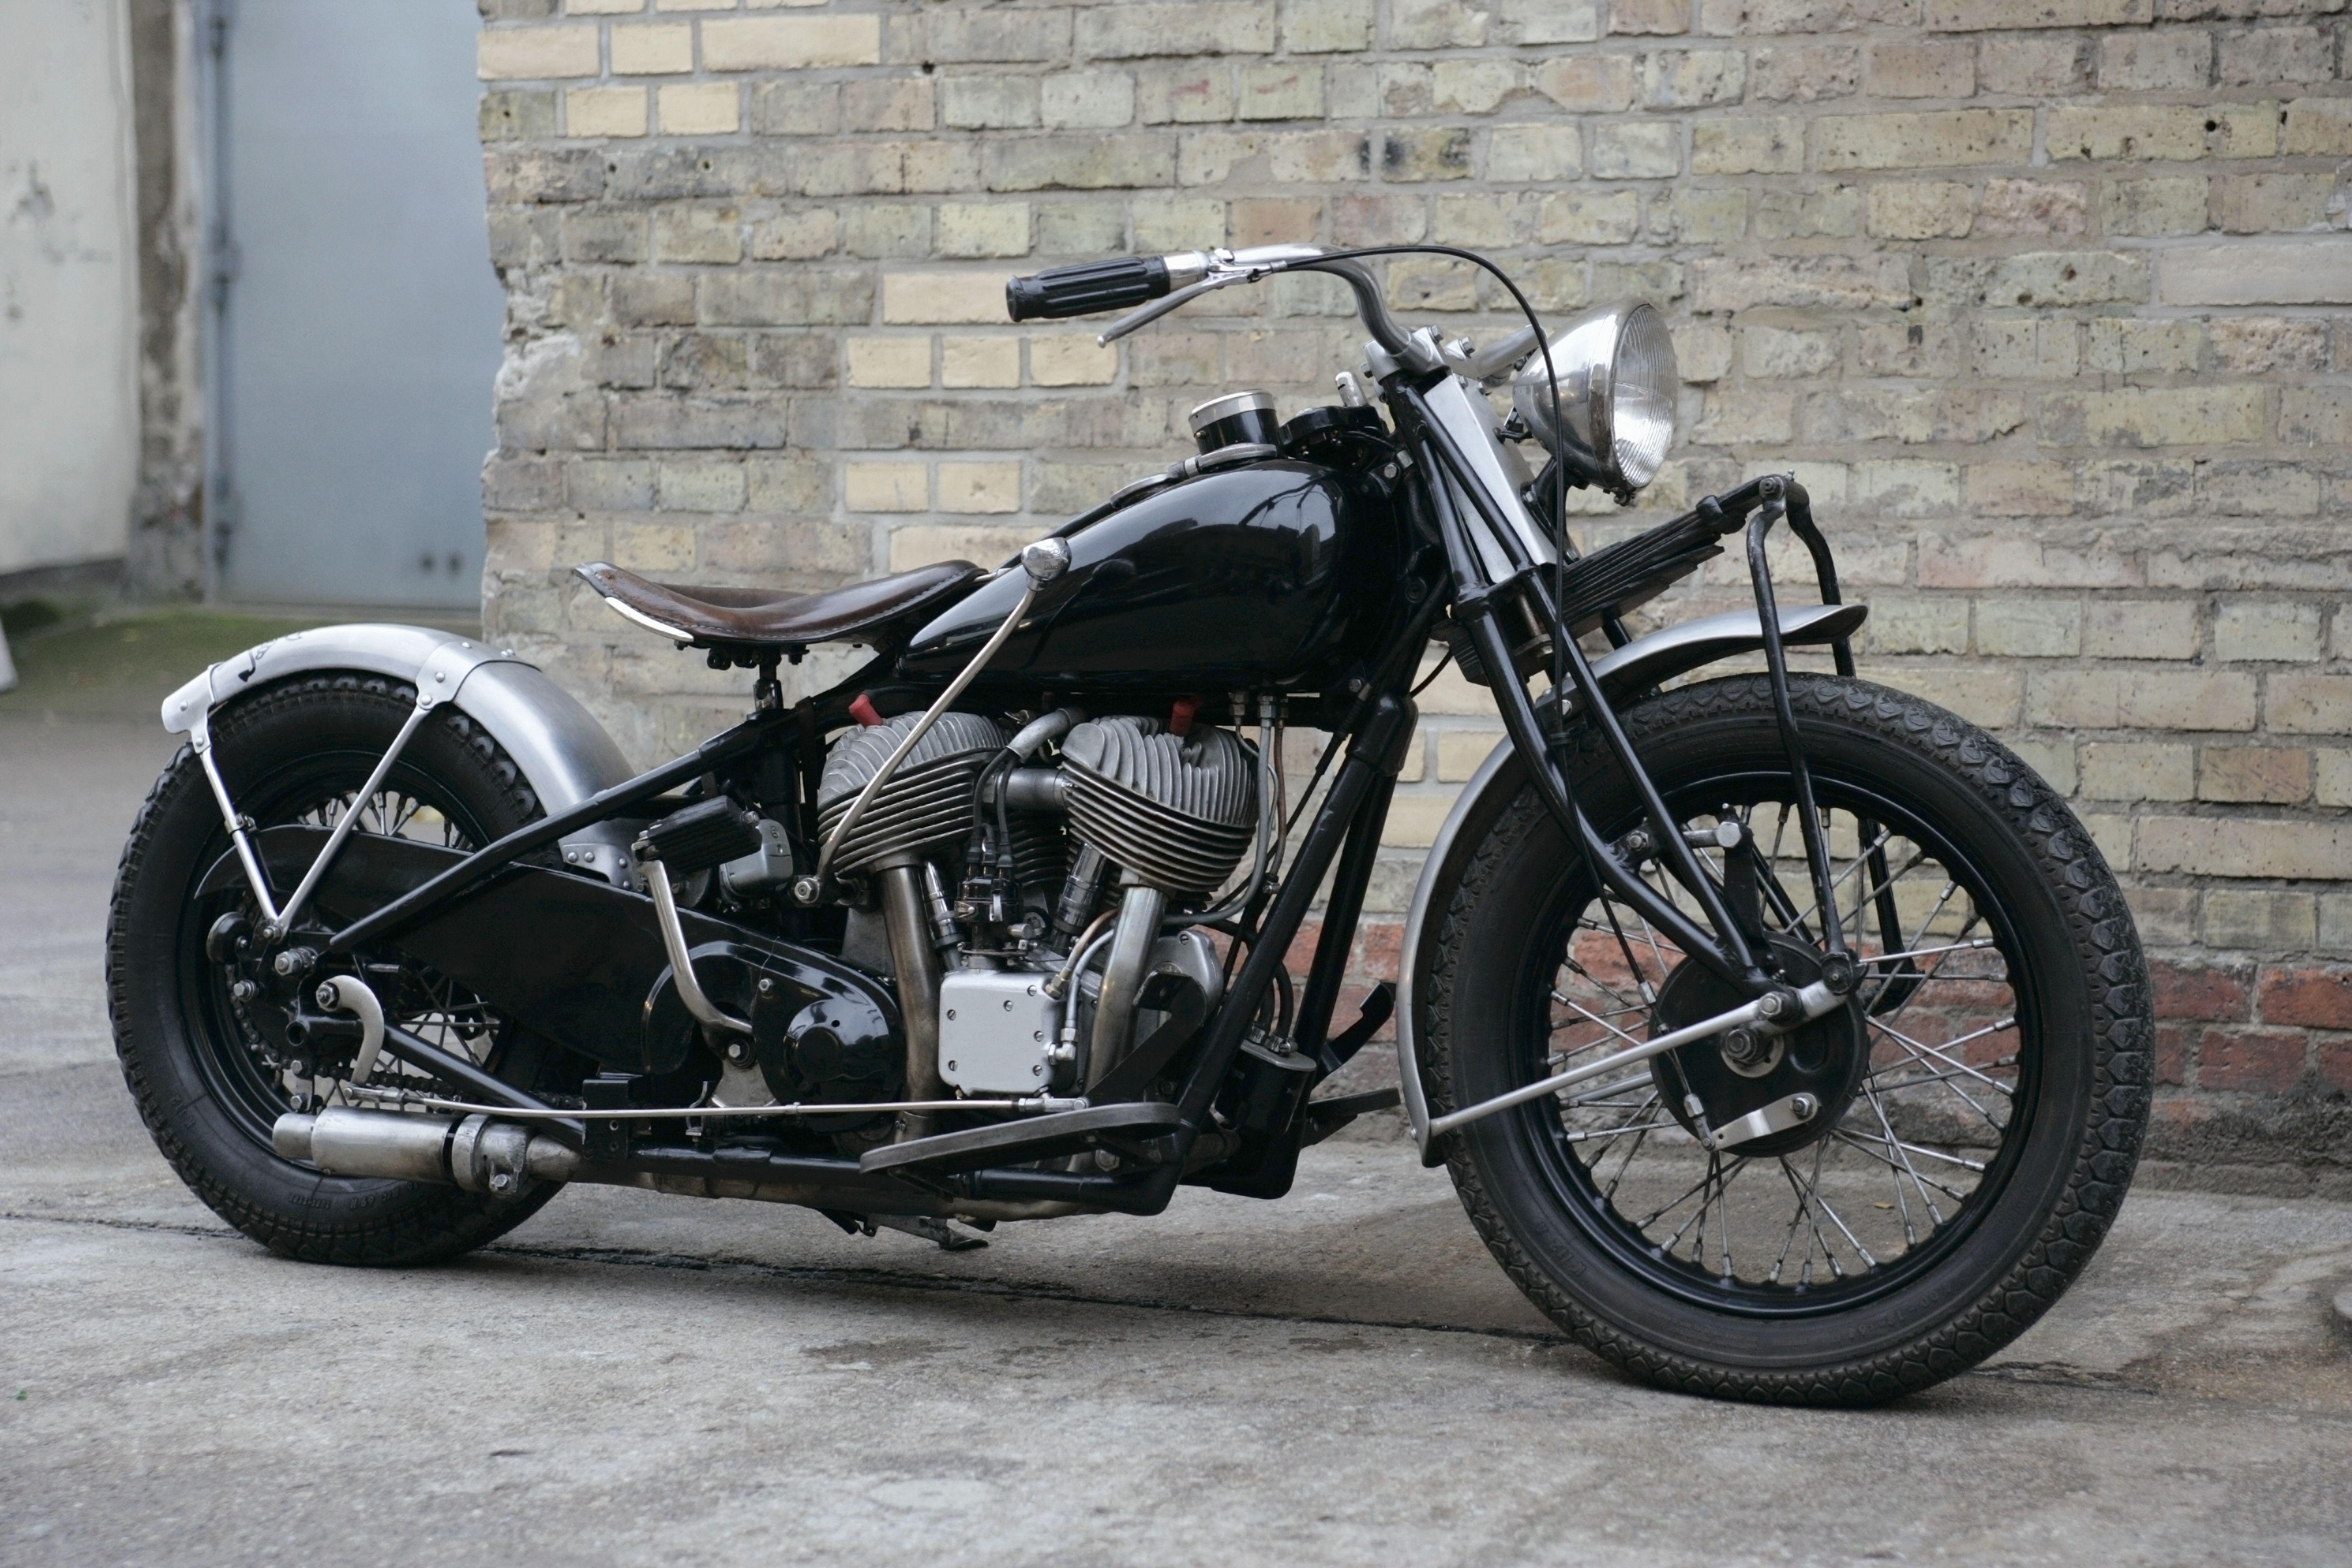 motorcycle classic restoration antique side johnson company auto motorcycles bike motor